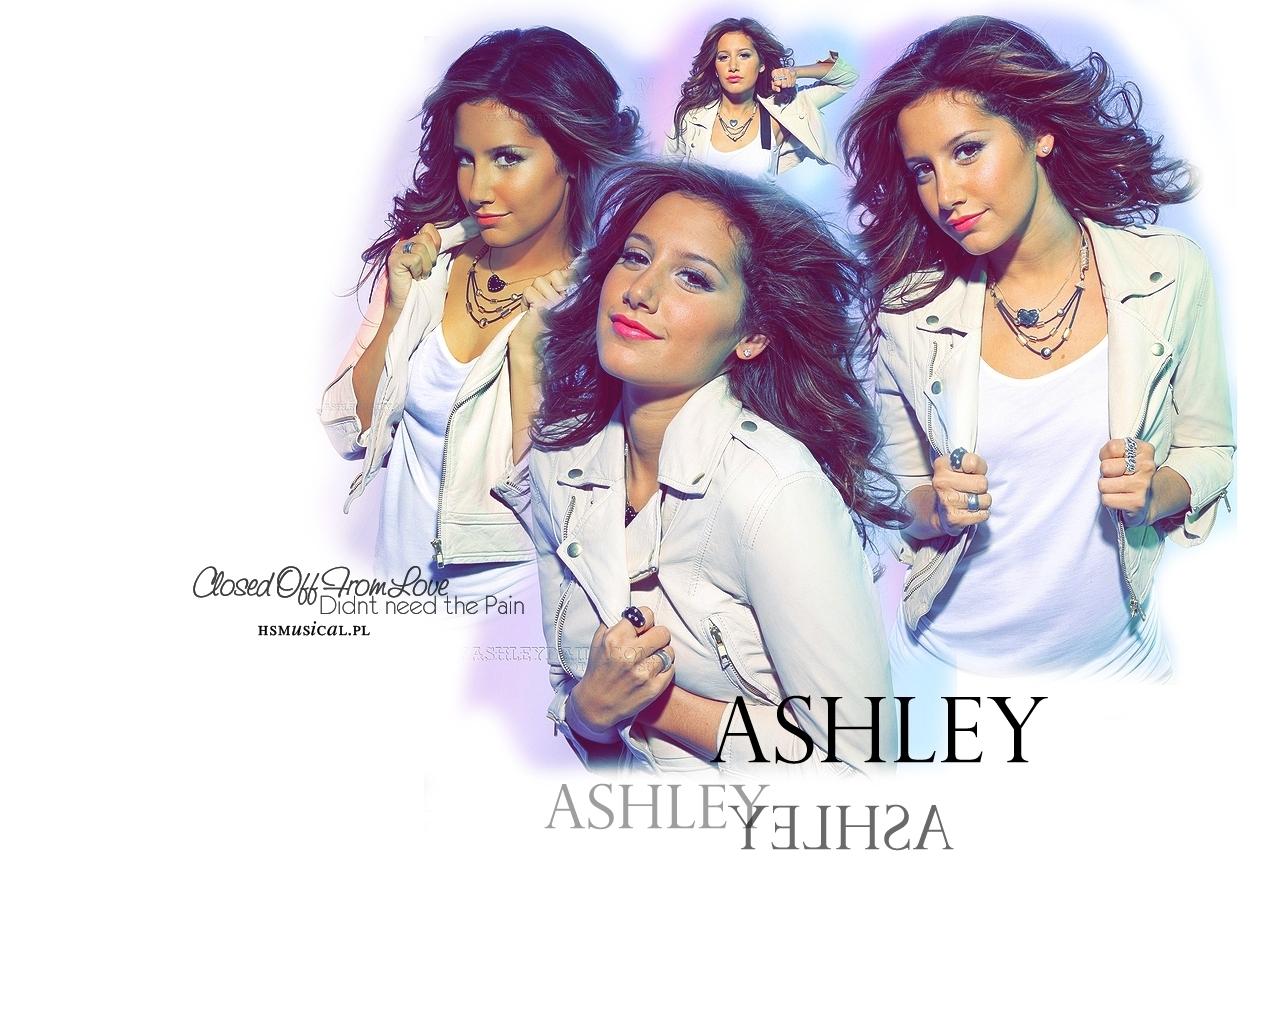 http://1.bp.blogspot.com/_N_JLM0TQH74/TQw4TvCvyrI/AAAAAAAAAHY/t6QkLHBwoxY/s1600/Ashley_Tisdale_Wall+%252856%2529.jpg